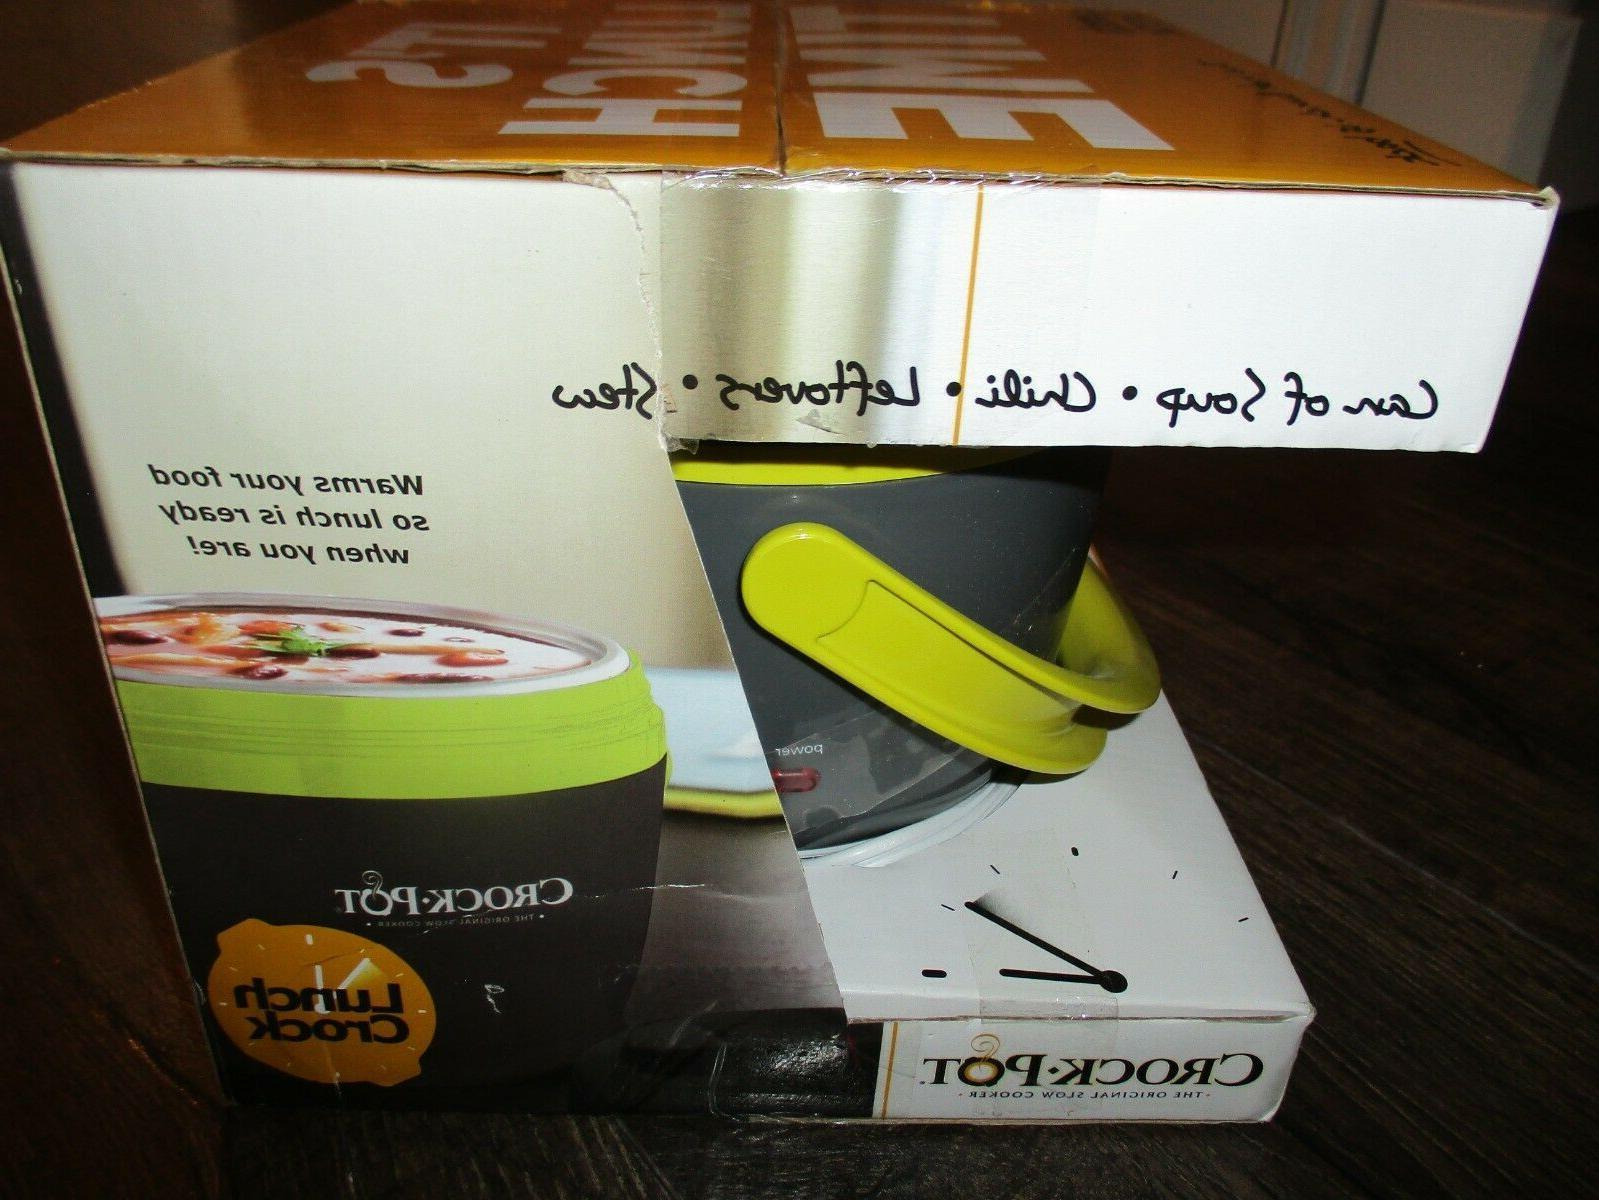 New Crock-Pot Food Warmer Lunch Box